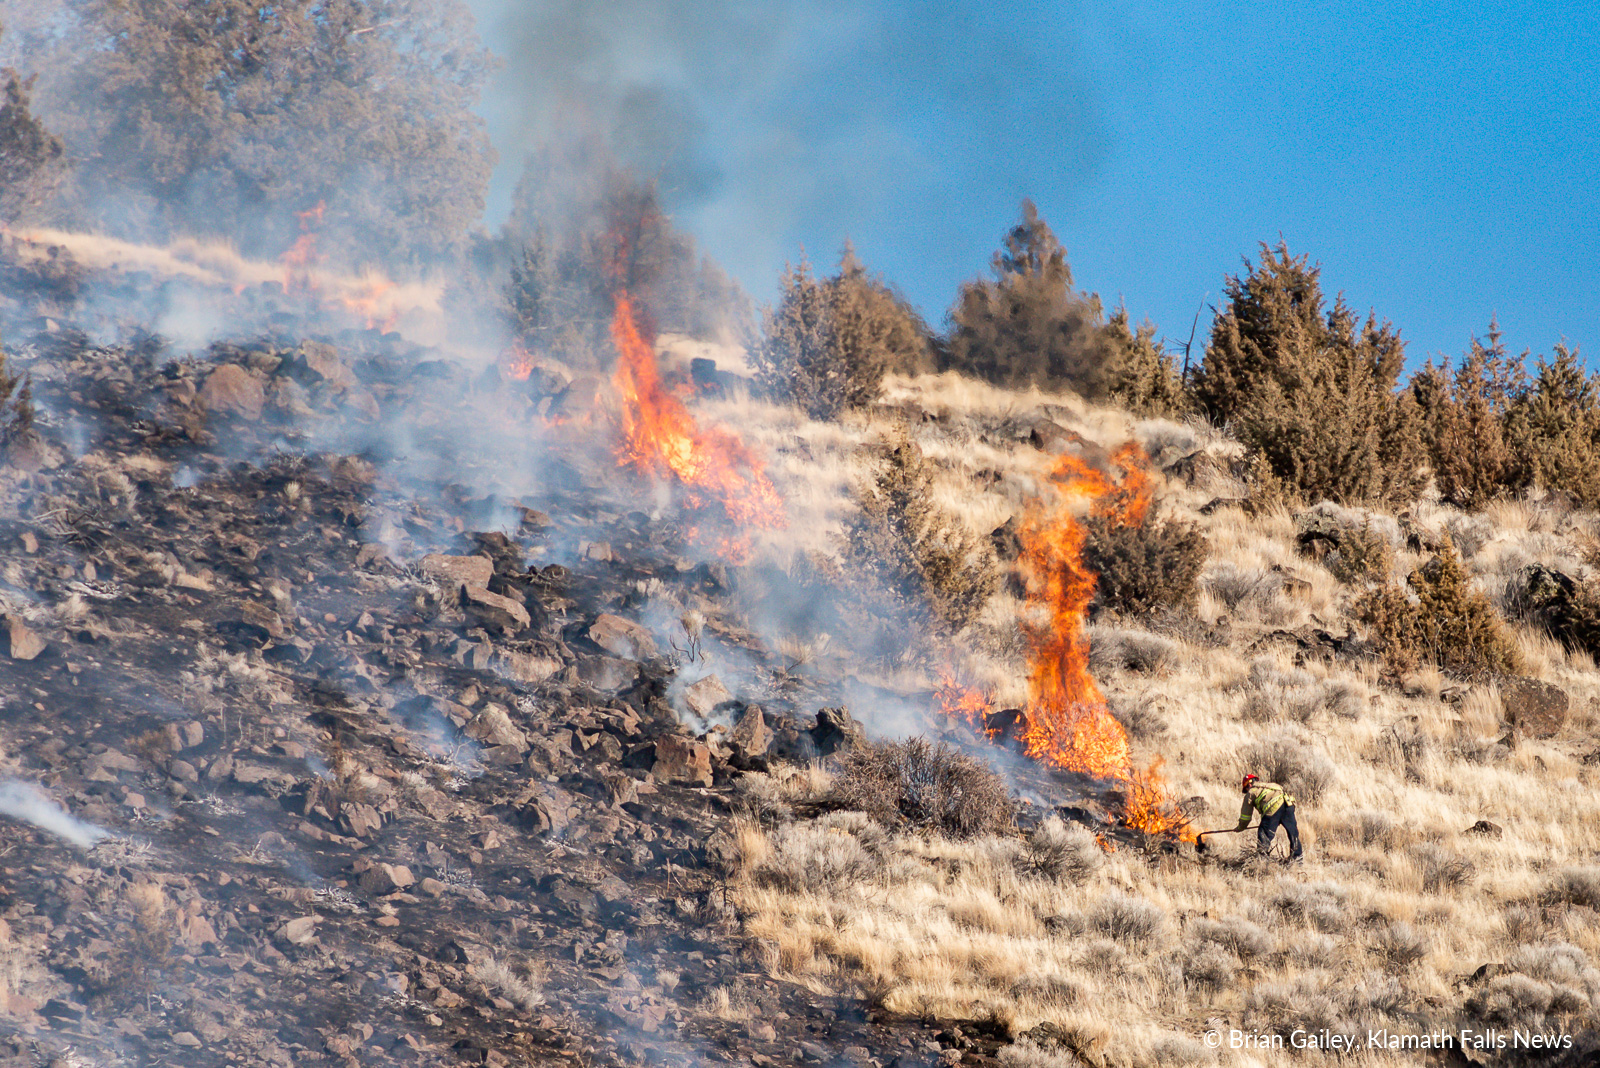 A firefighter battles flames on Stukel Mountain in Klamath Falls, Oregon. January 14, 2019 (Brian Gailey)